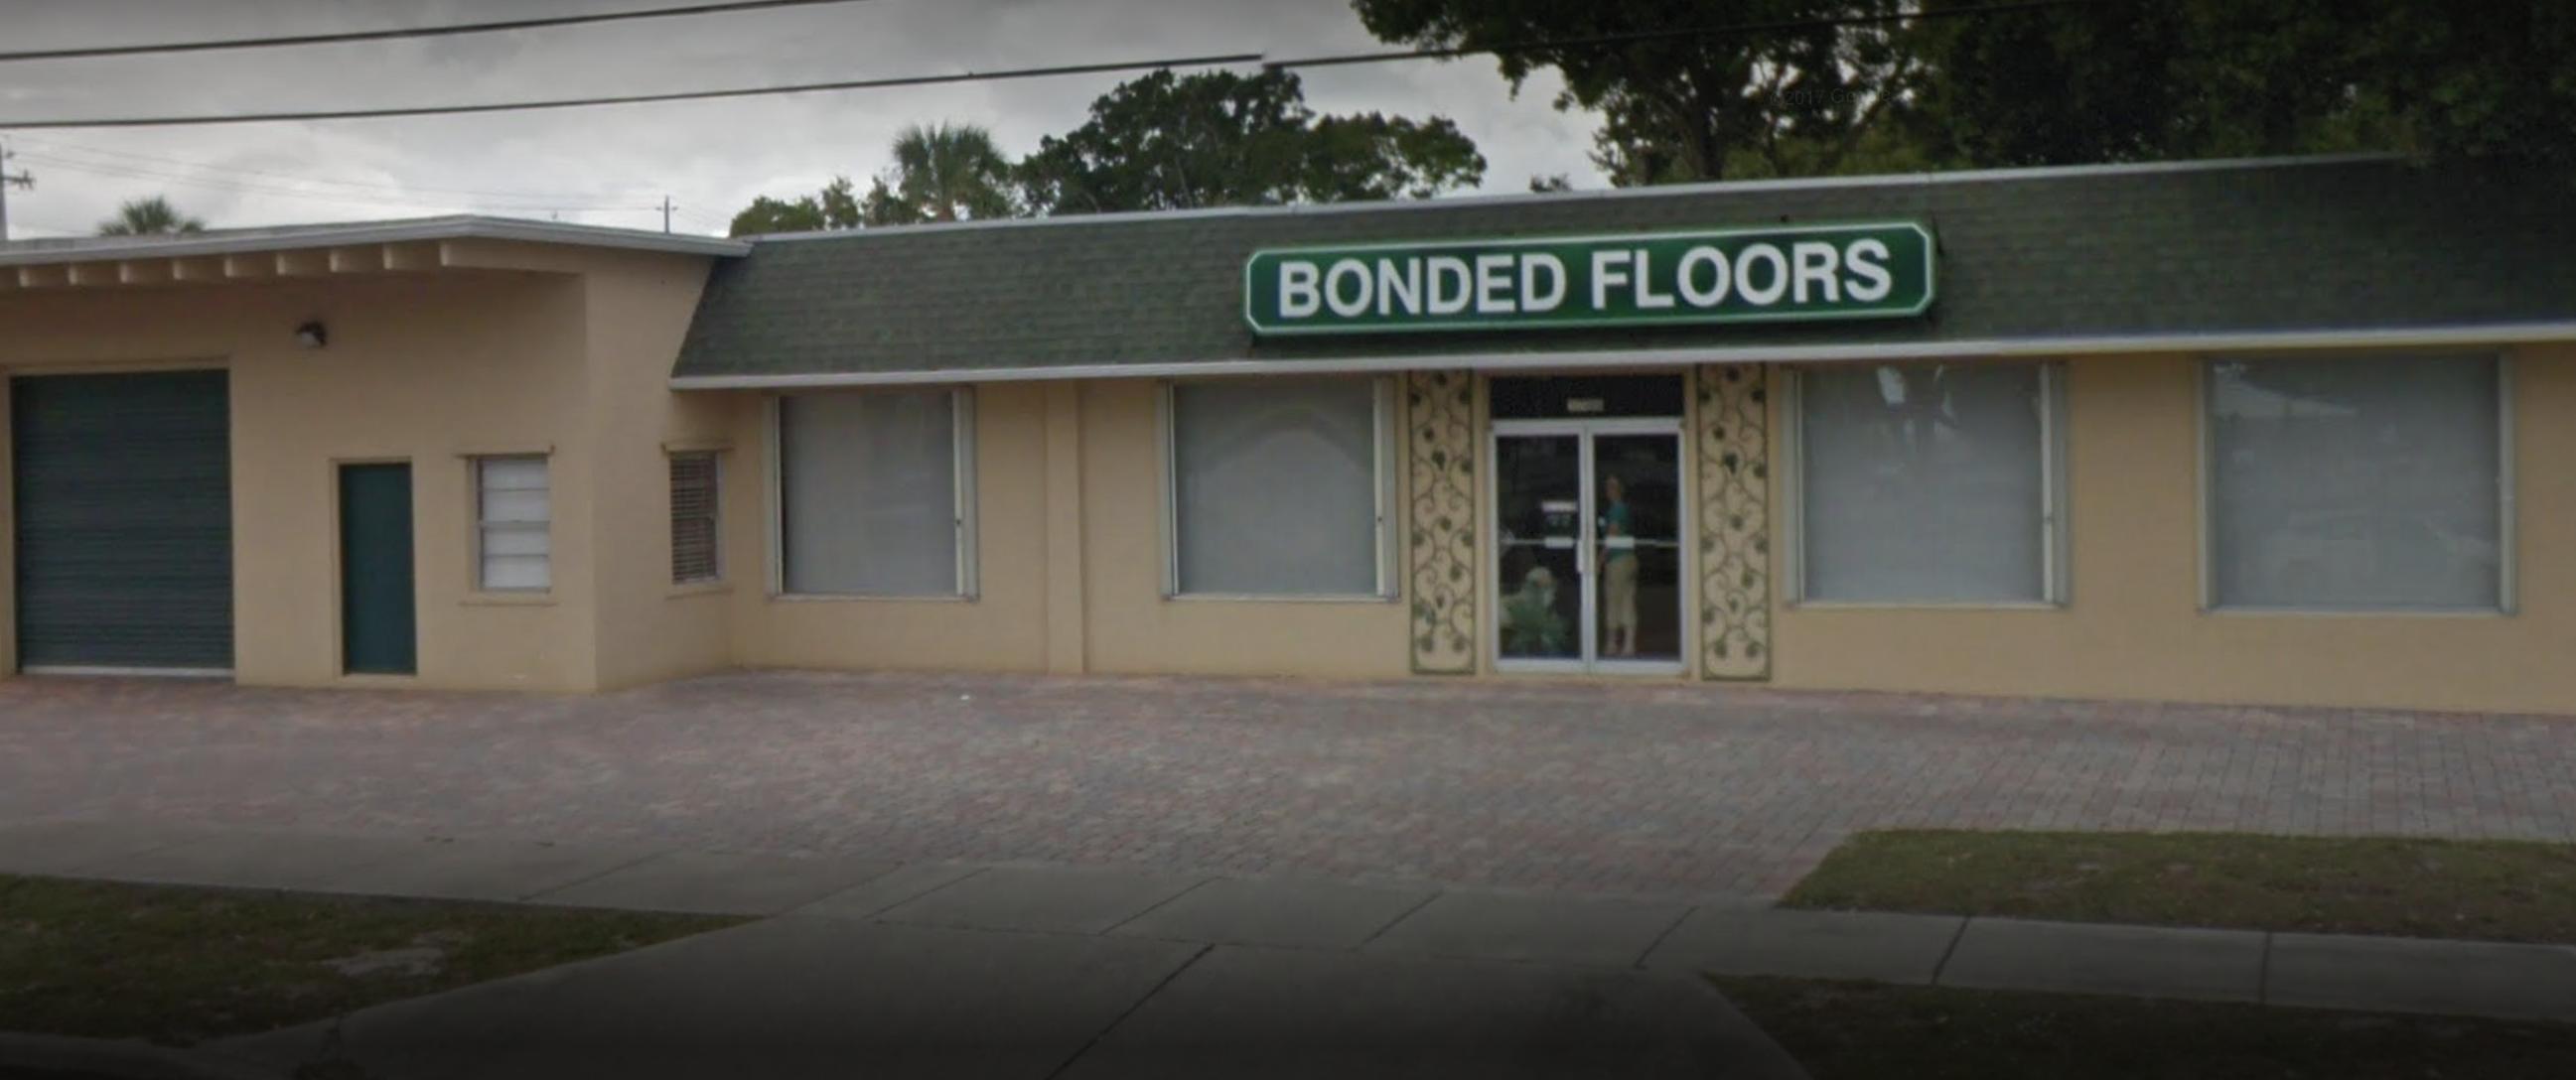 Bonded Floors Of Vero Beach - 1755 10th Ave, Vero Beach, FL 32960